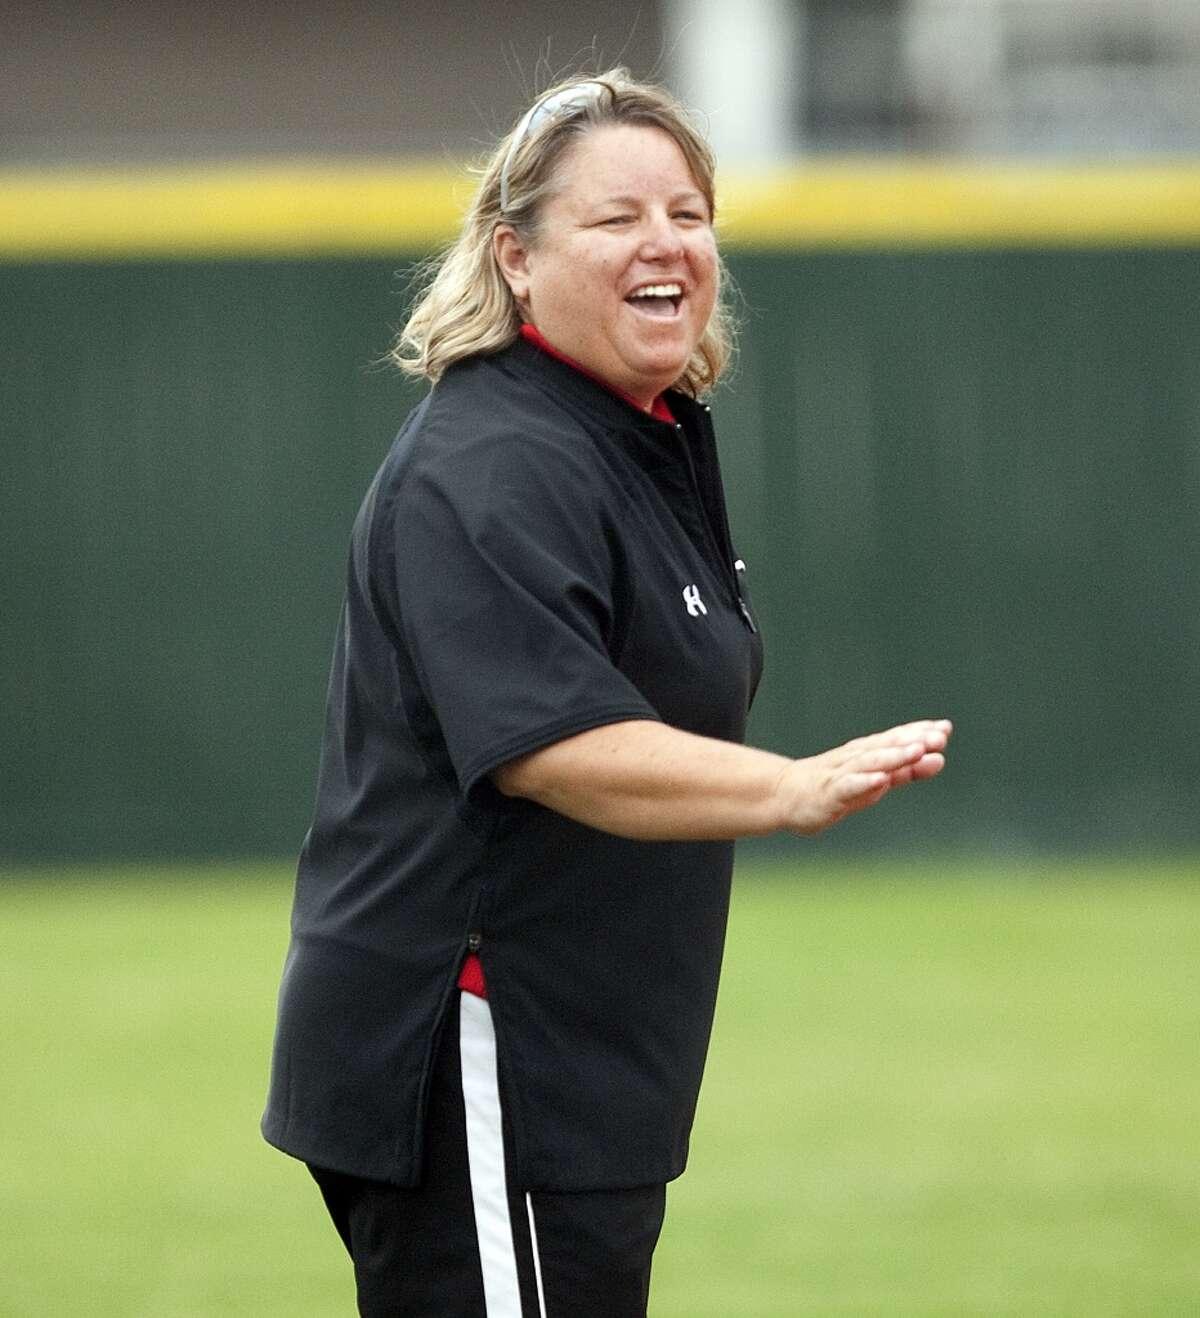 Memorial softball coach Tina Young laughs prior to a April 27, 2009 game.